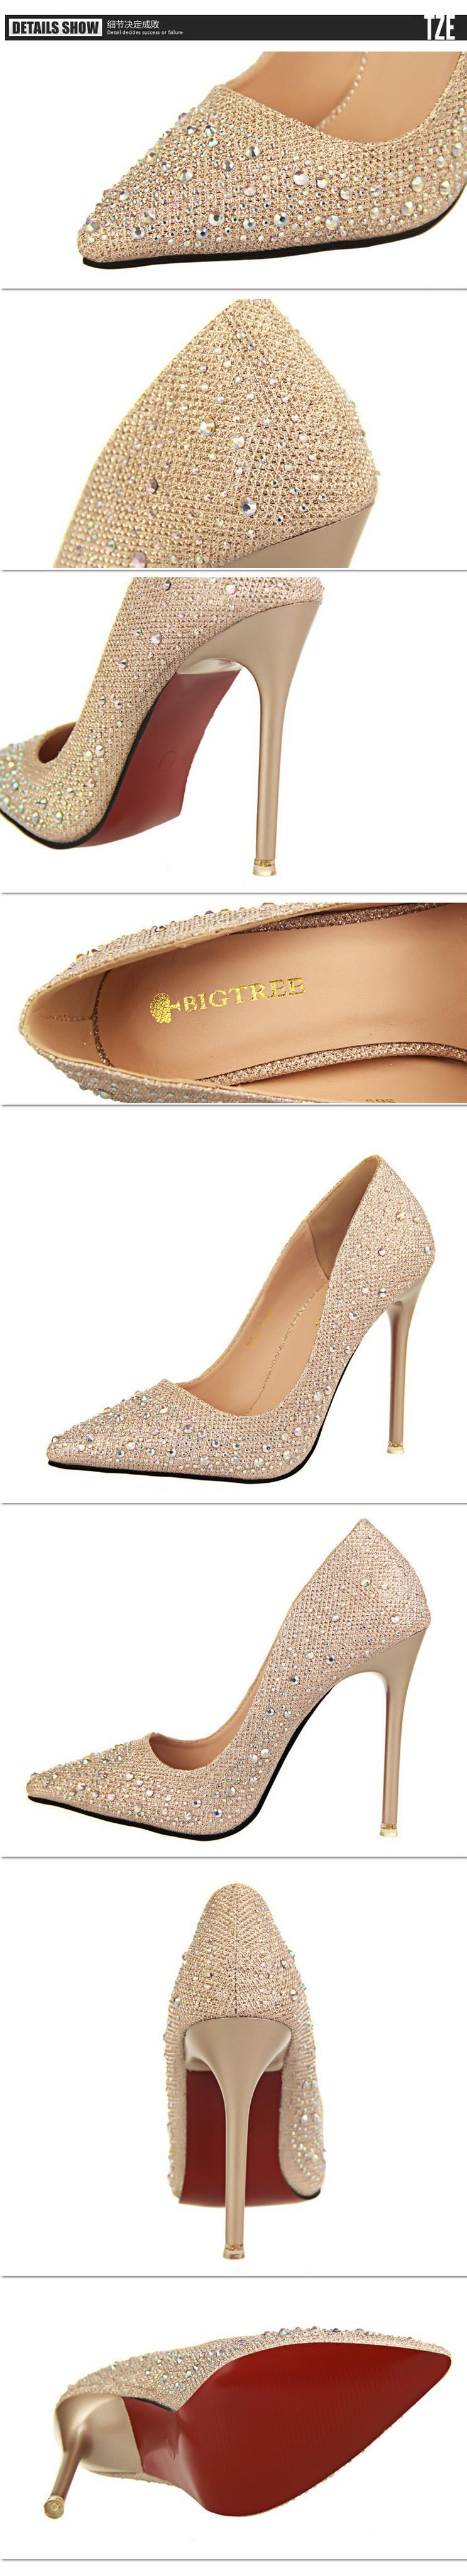 Fashion Women's Pumps Sexy Rhinestone Wedding Shoes New Arrival Women Shoes Sapatos Femininos Sexy Red Bottom High Heels ZX35